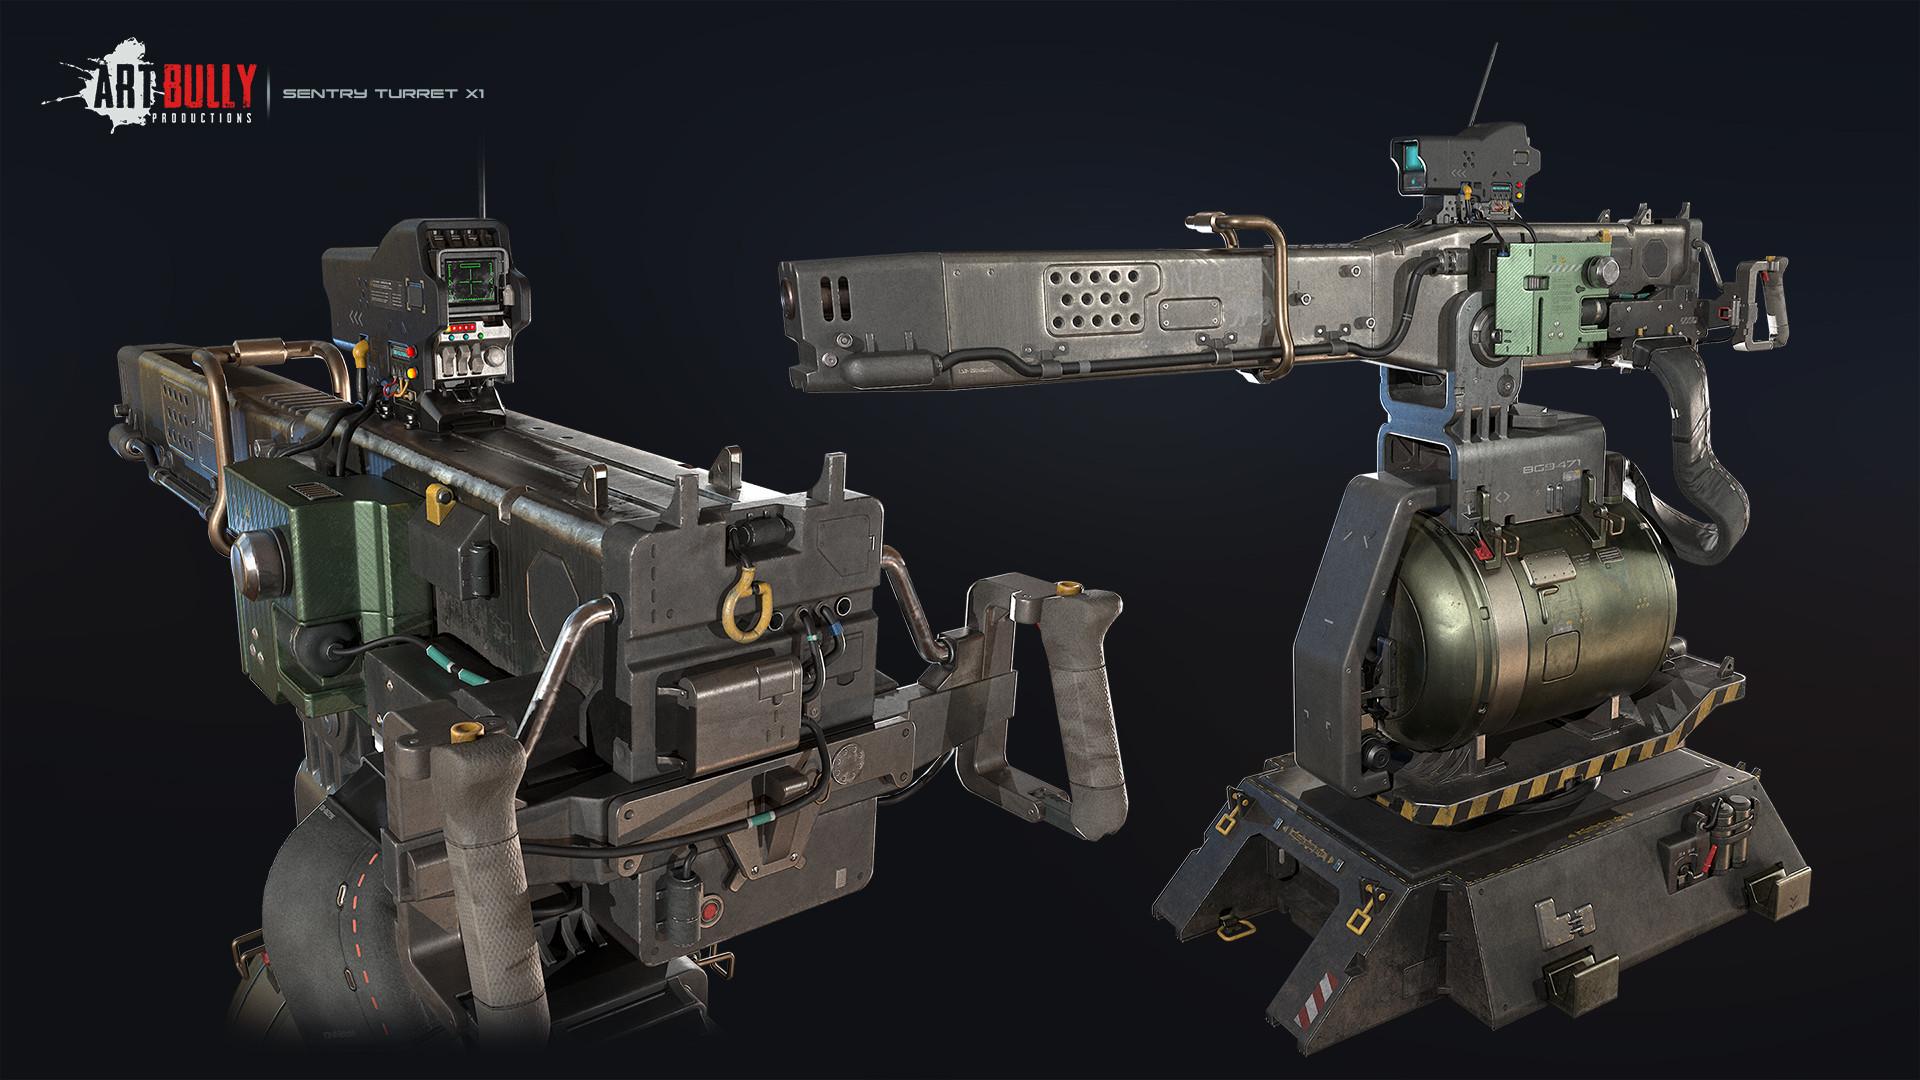 Patrick nuckels sentry turret x1 render 01